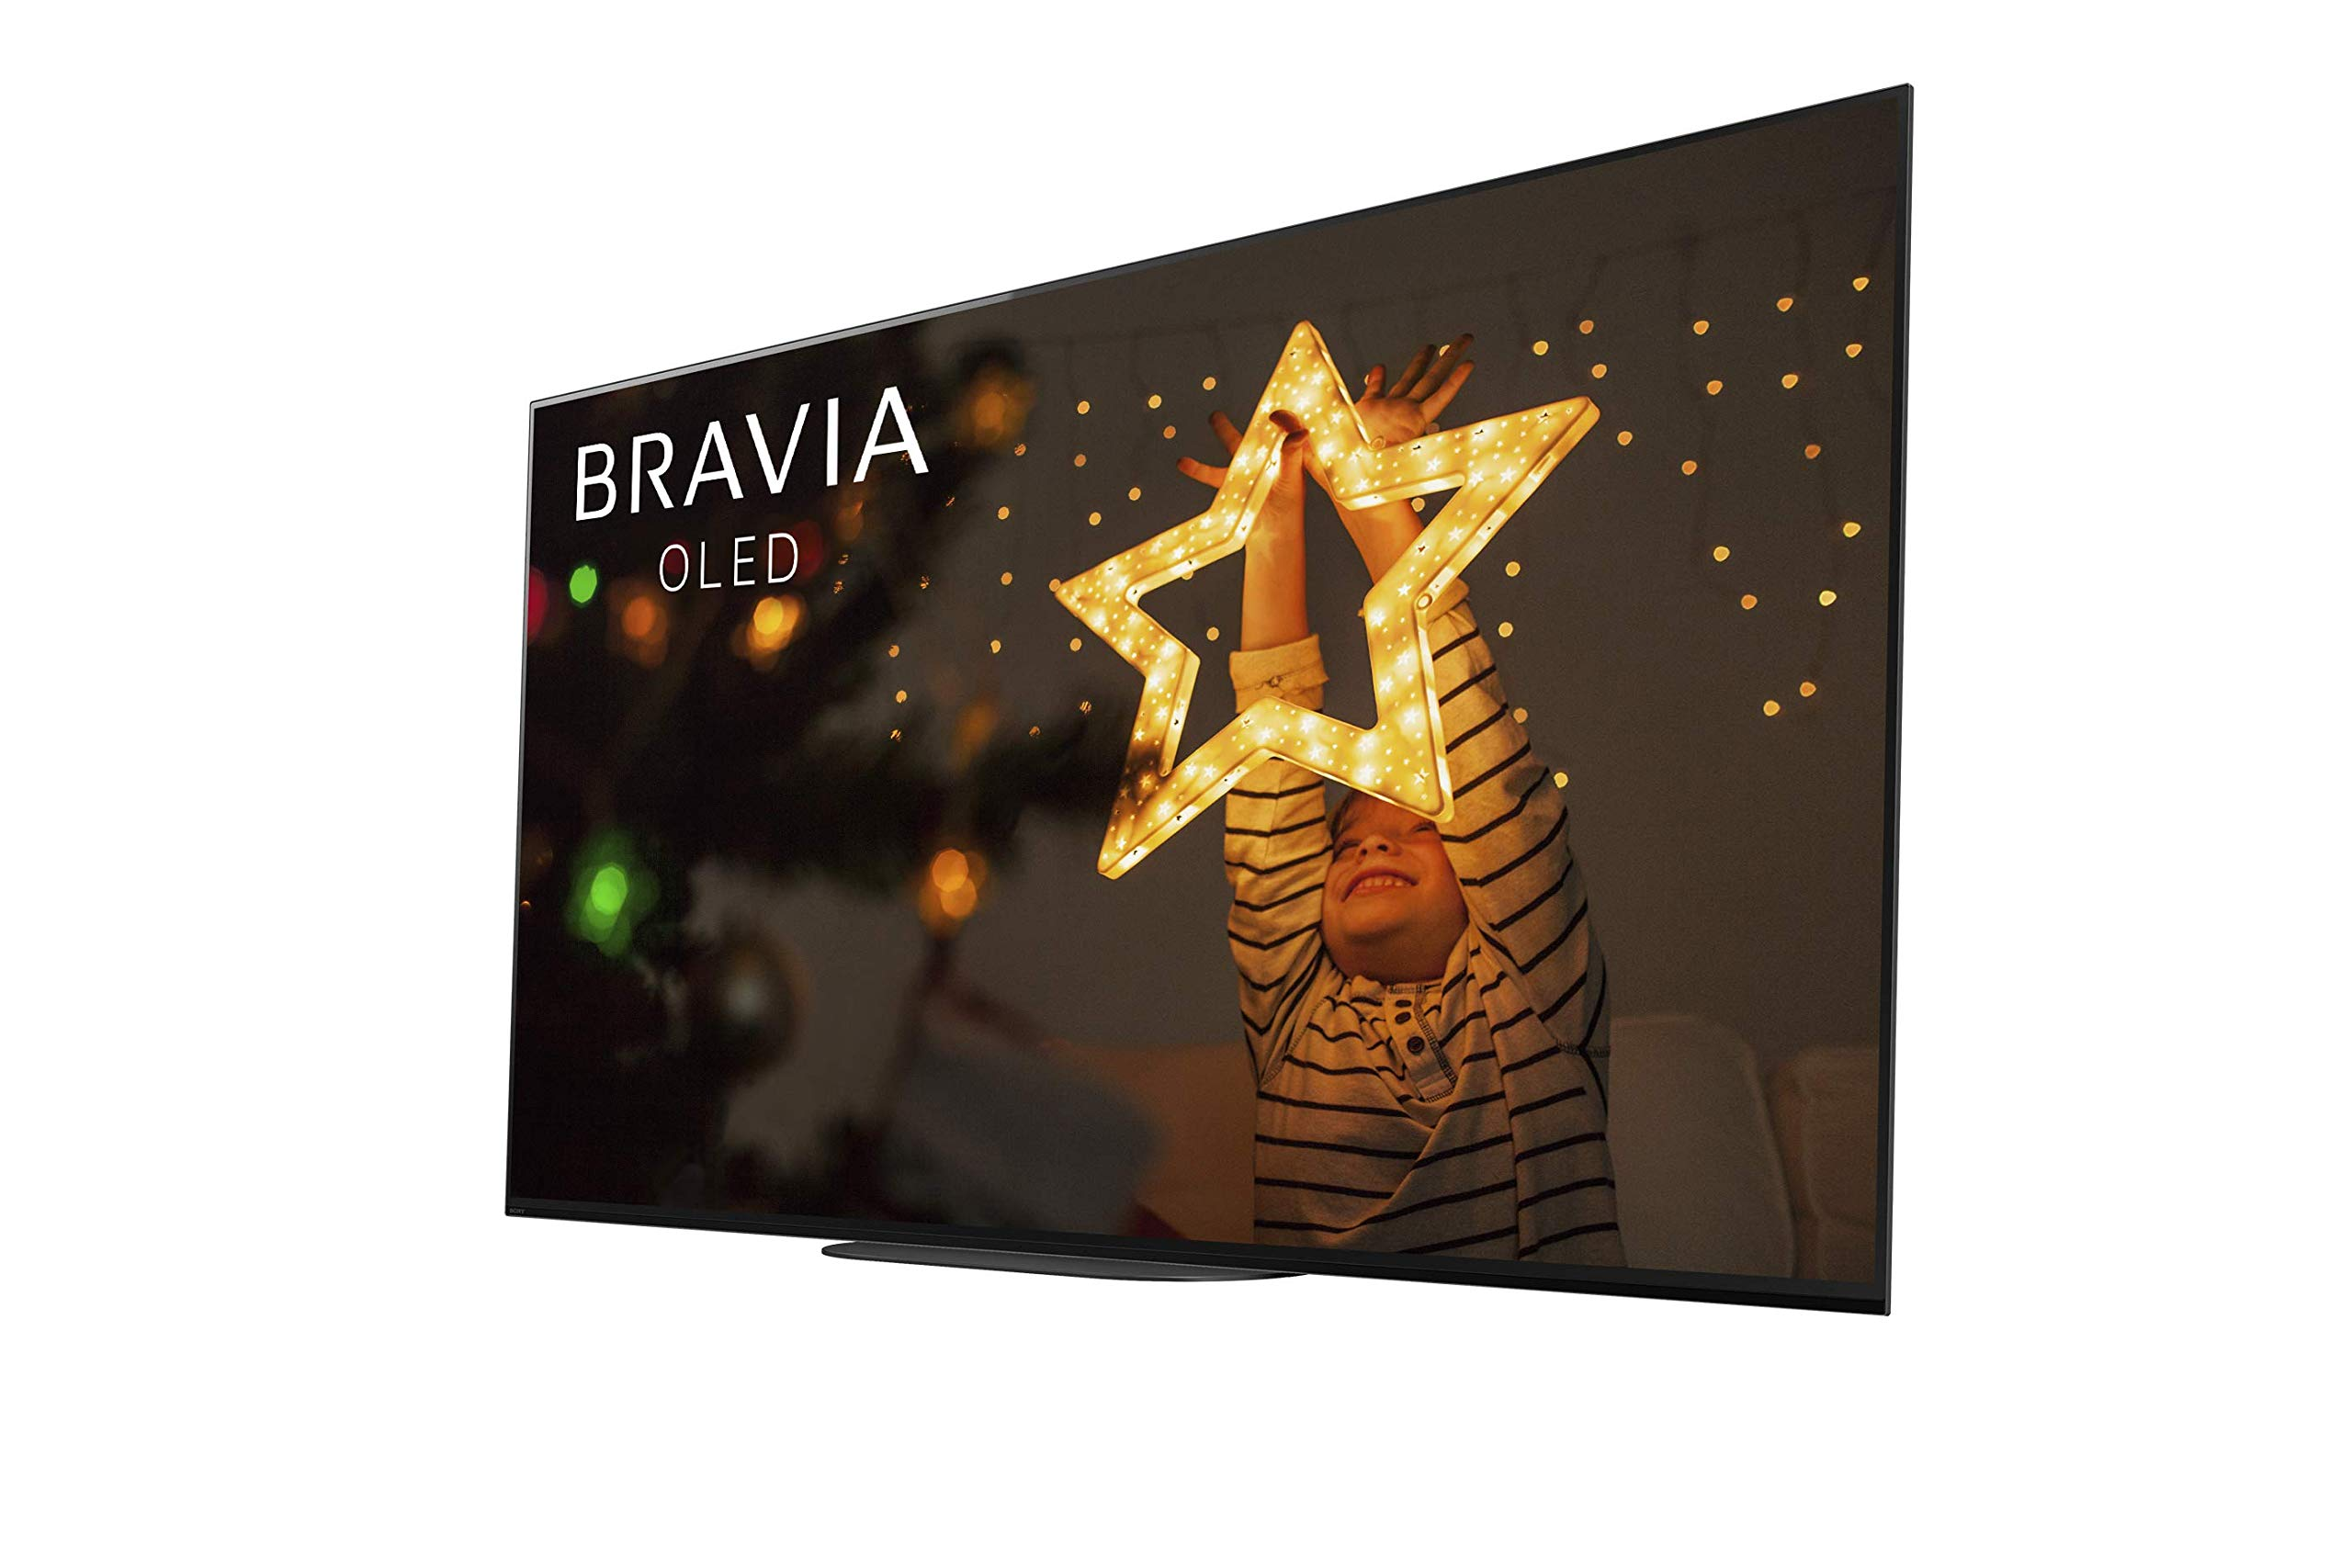 Sony XBR-65A9G 4K Ultra HD Smart Master Series BRAVIA OLED TV (2019 Model) 3